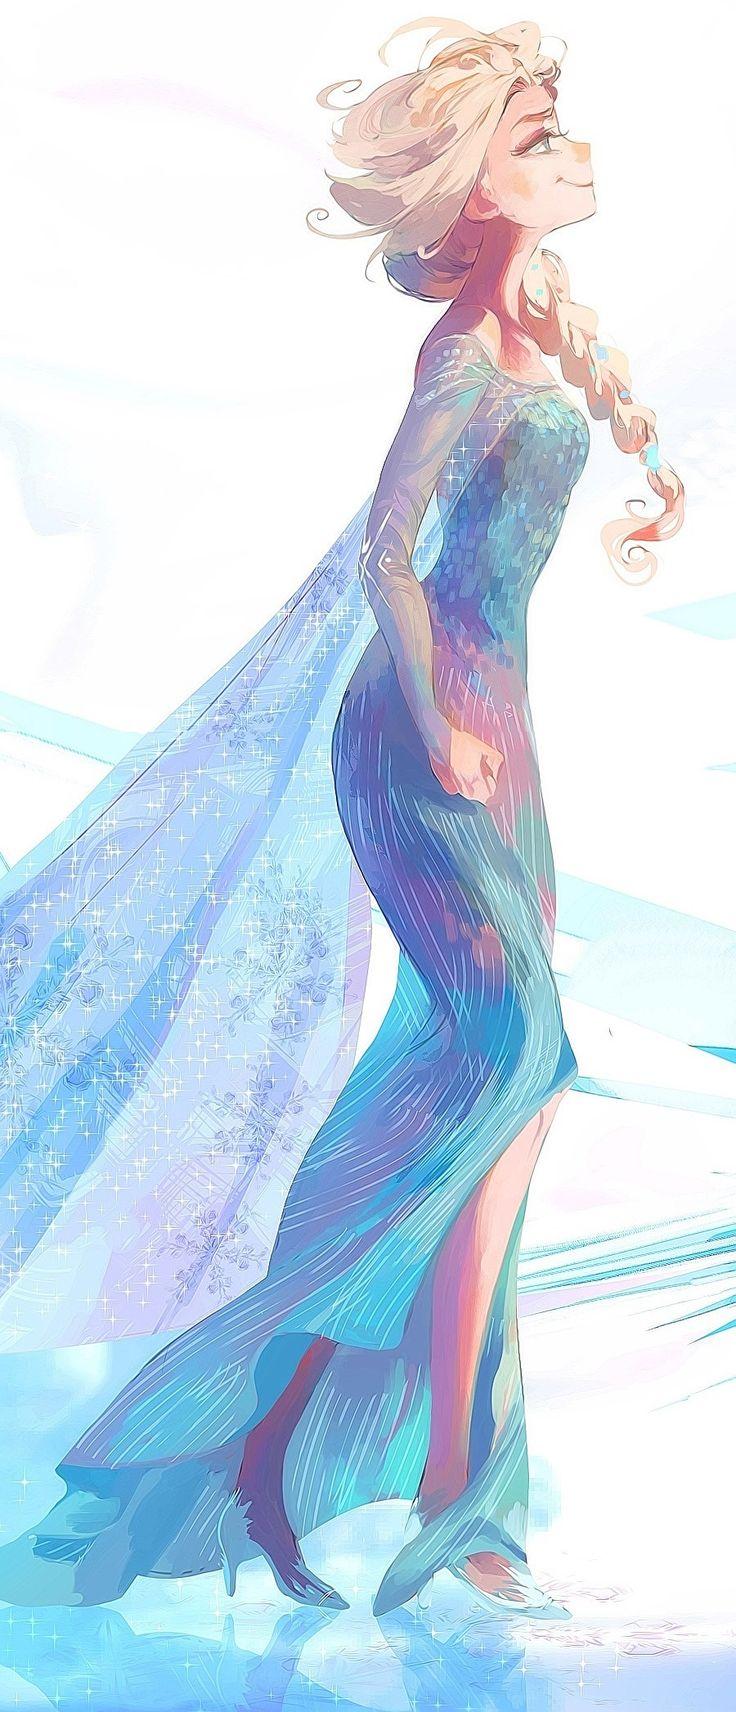 Let the storm rage on! #Elsa